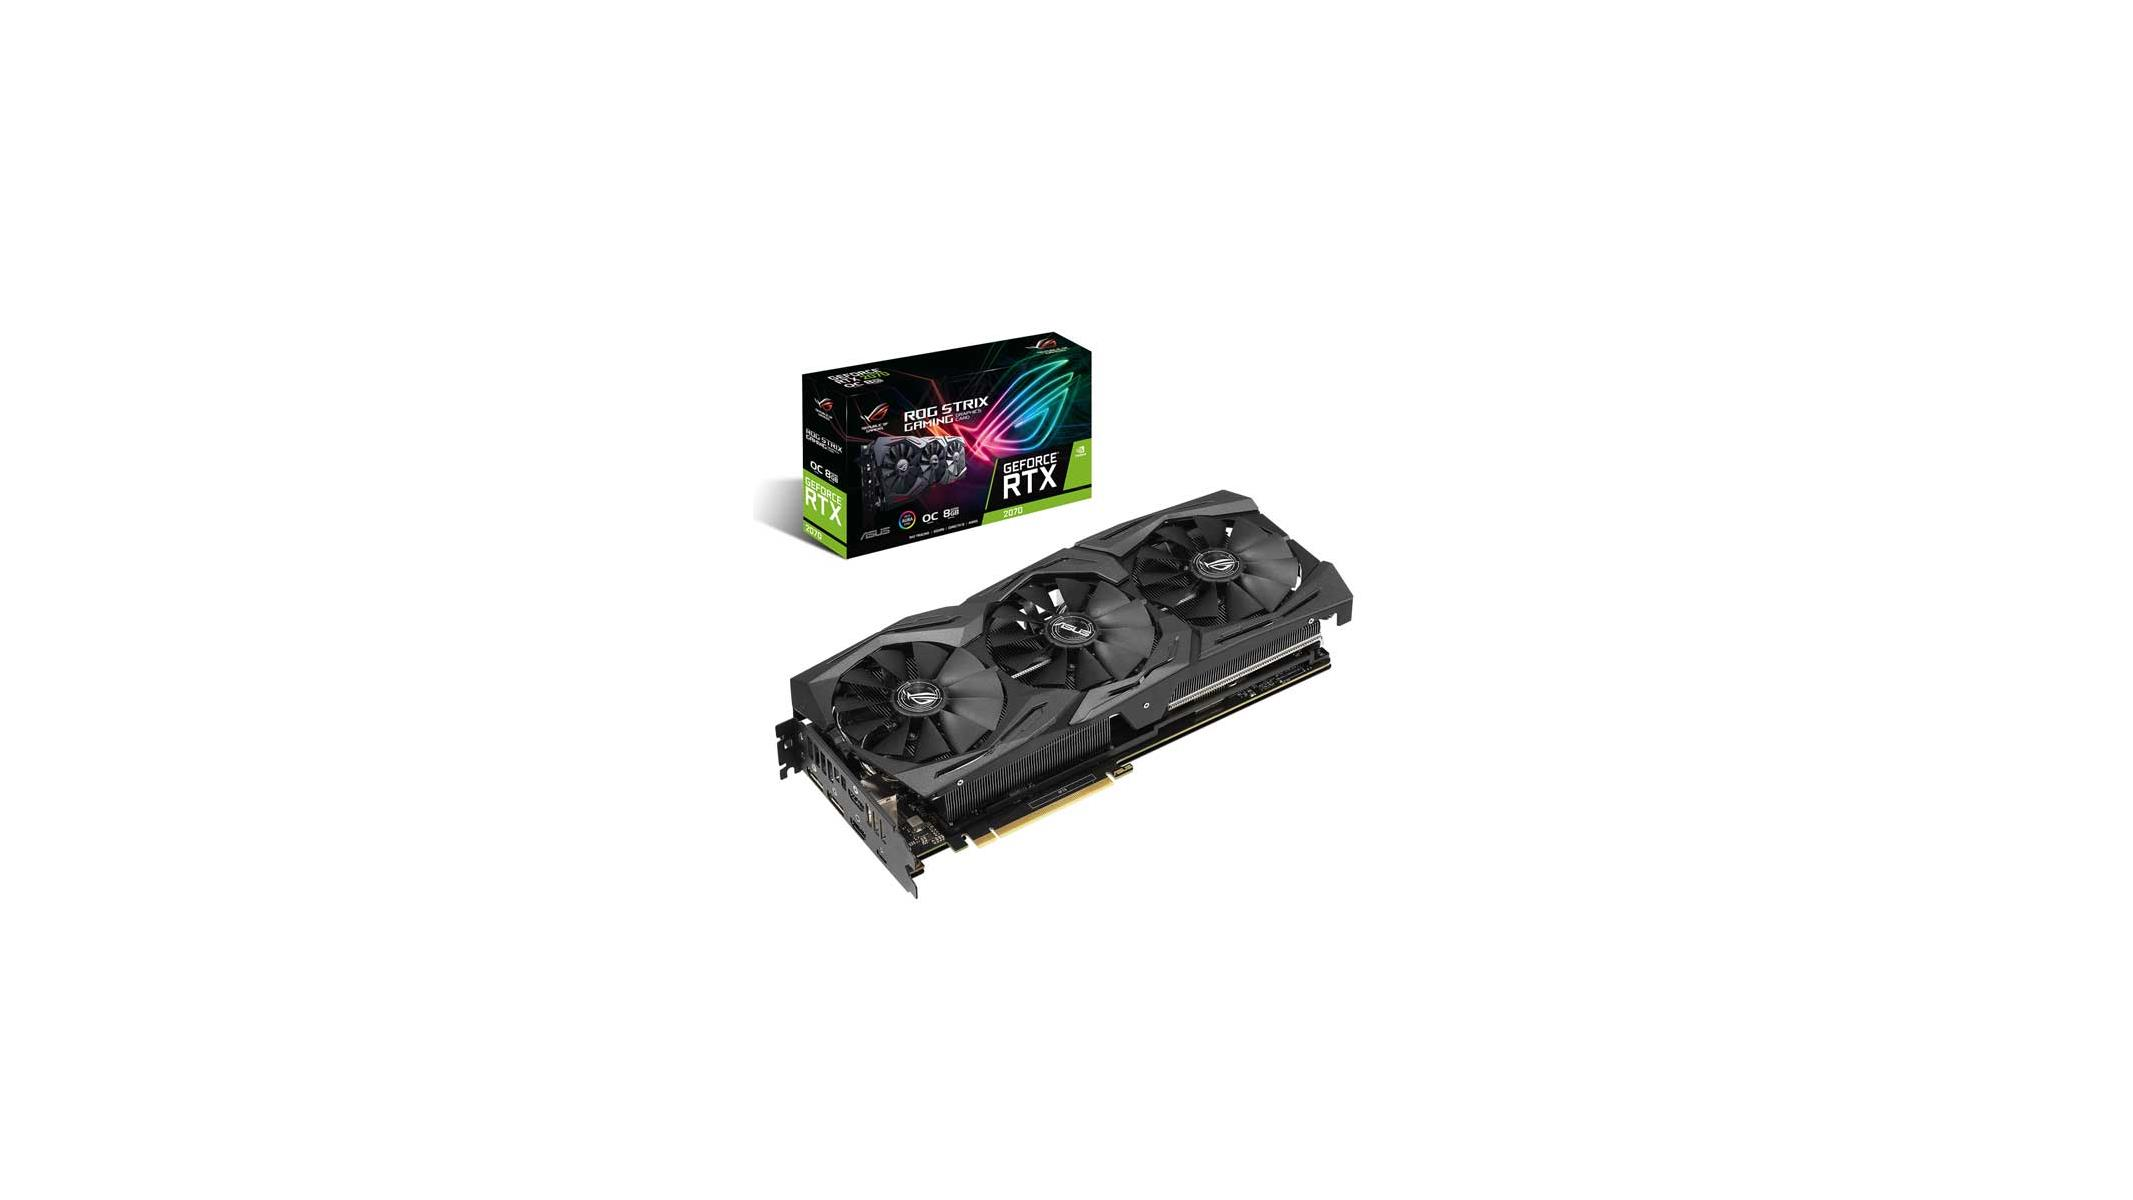 ASUS ROG Strix, Dual, And Turbo GeForce RTX 2070 Cards Stoke Geek